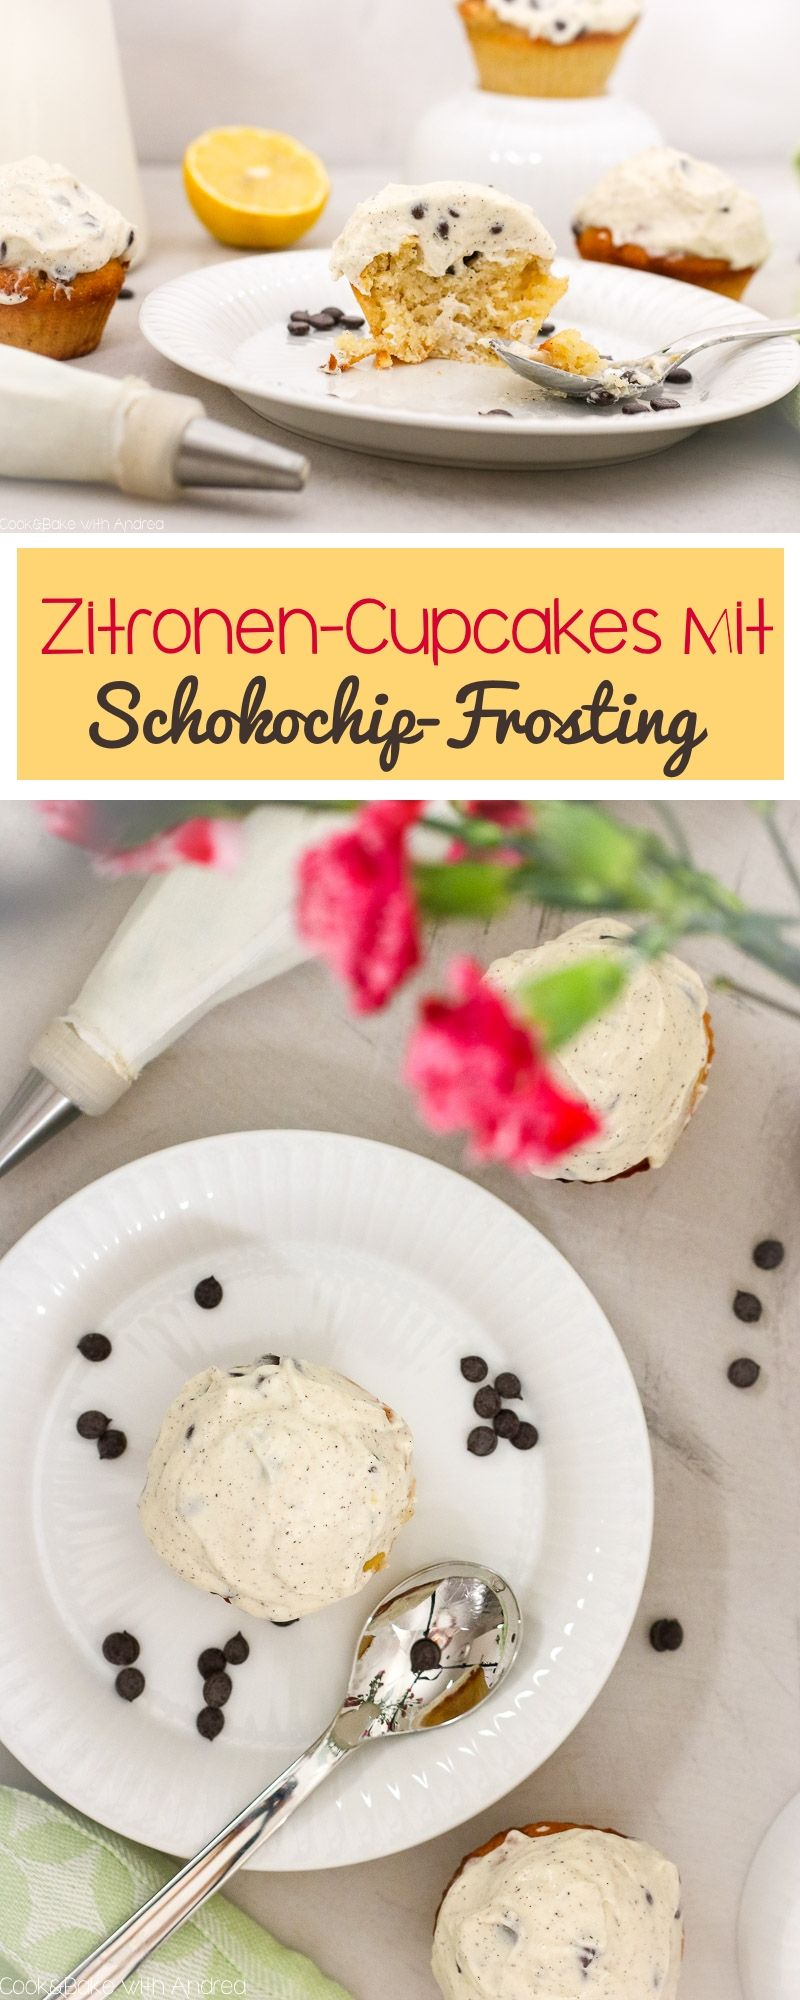 Zitronen-Cupcakes mit Schokochip-Frosting #lemonfrosting